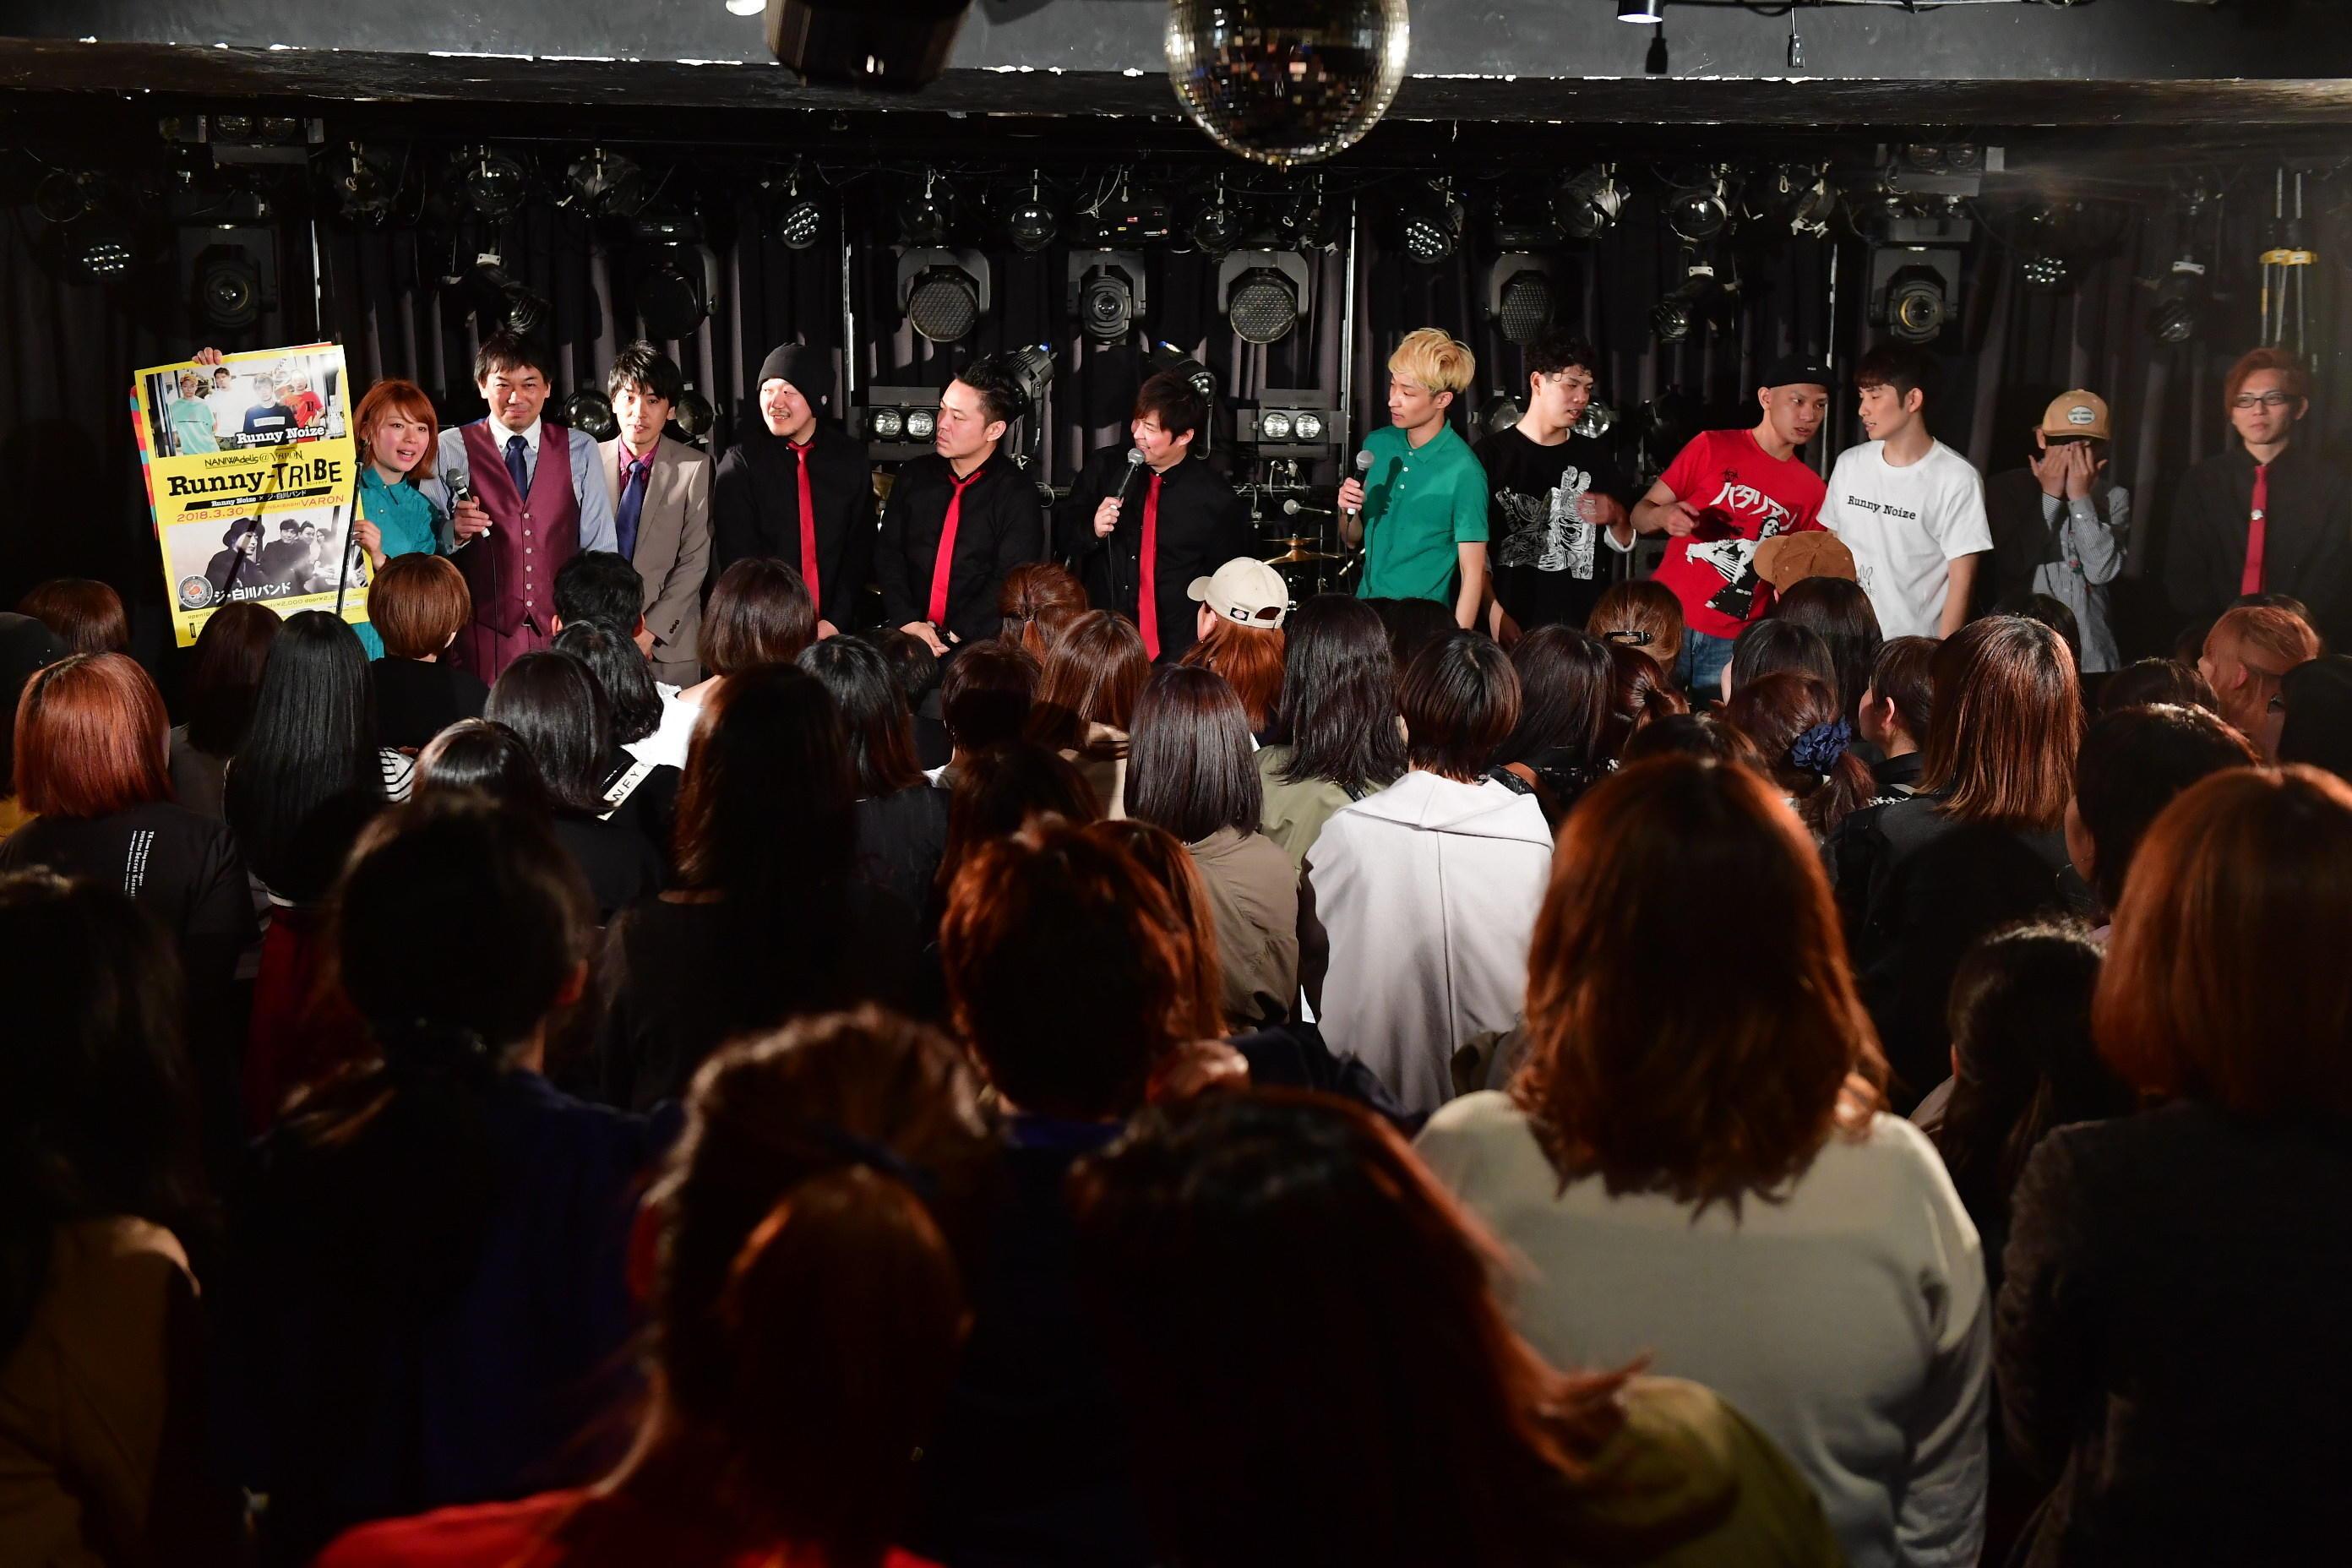 http://news.yoshimoto.co.jp/20180331130551-57d5b78926c3190a794dafcd95d6caf4d3ed4362.jpg